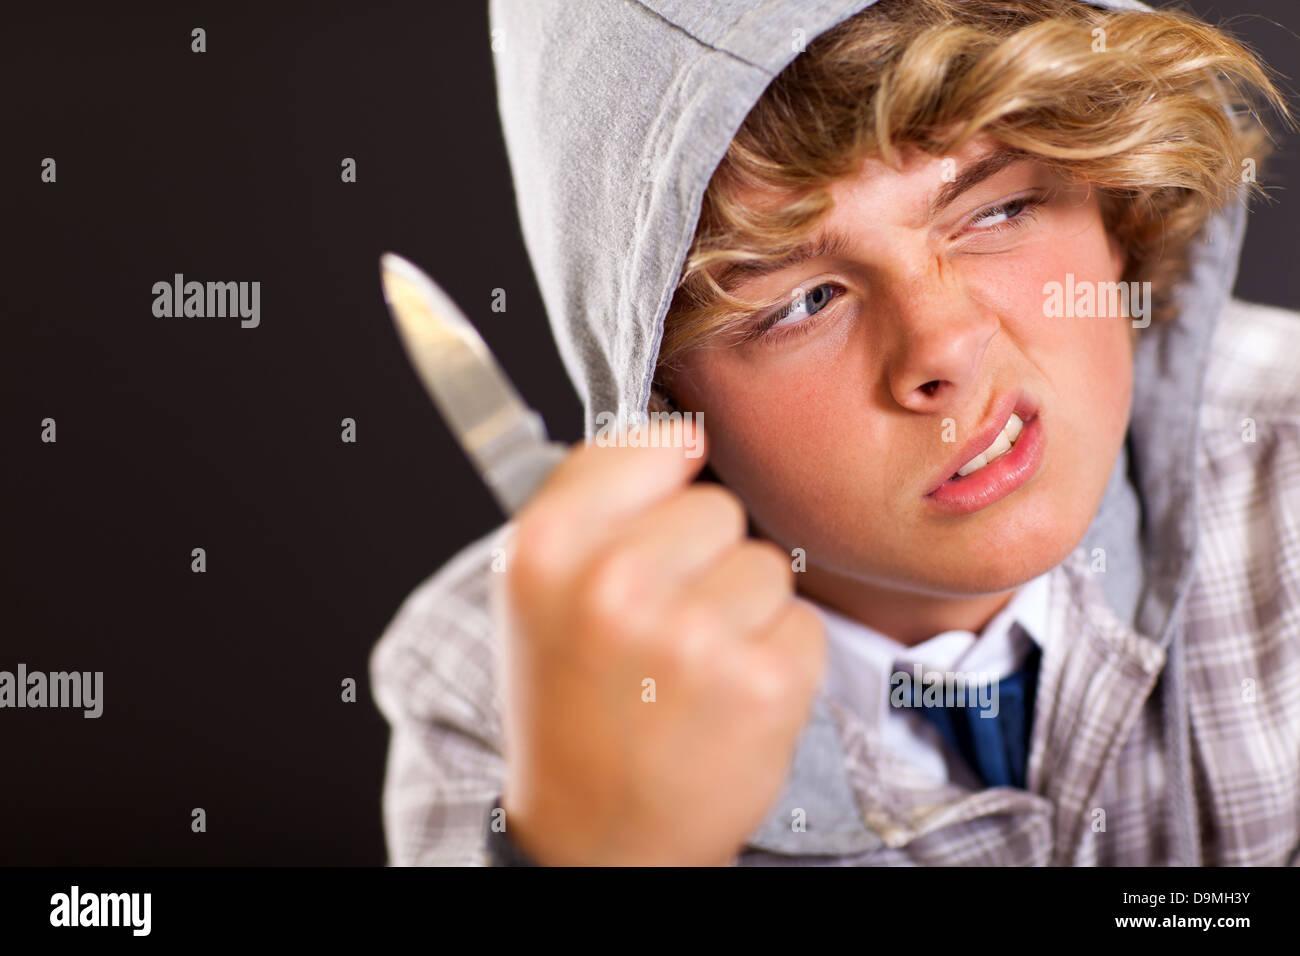 violent teen boy holding a knife on black background - Stock Image